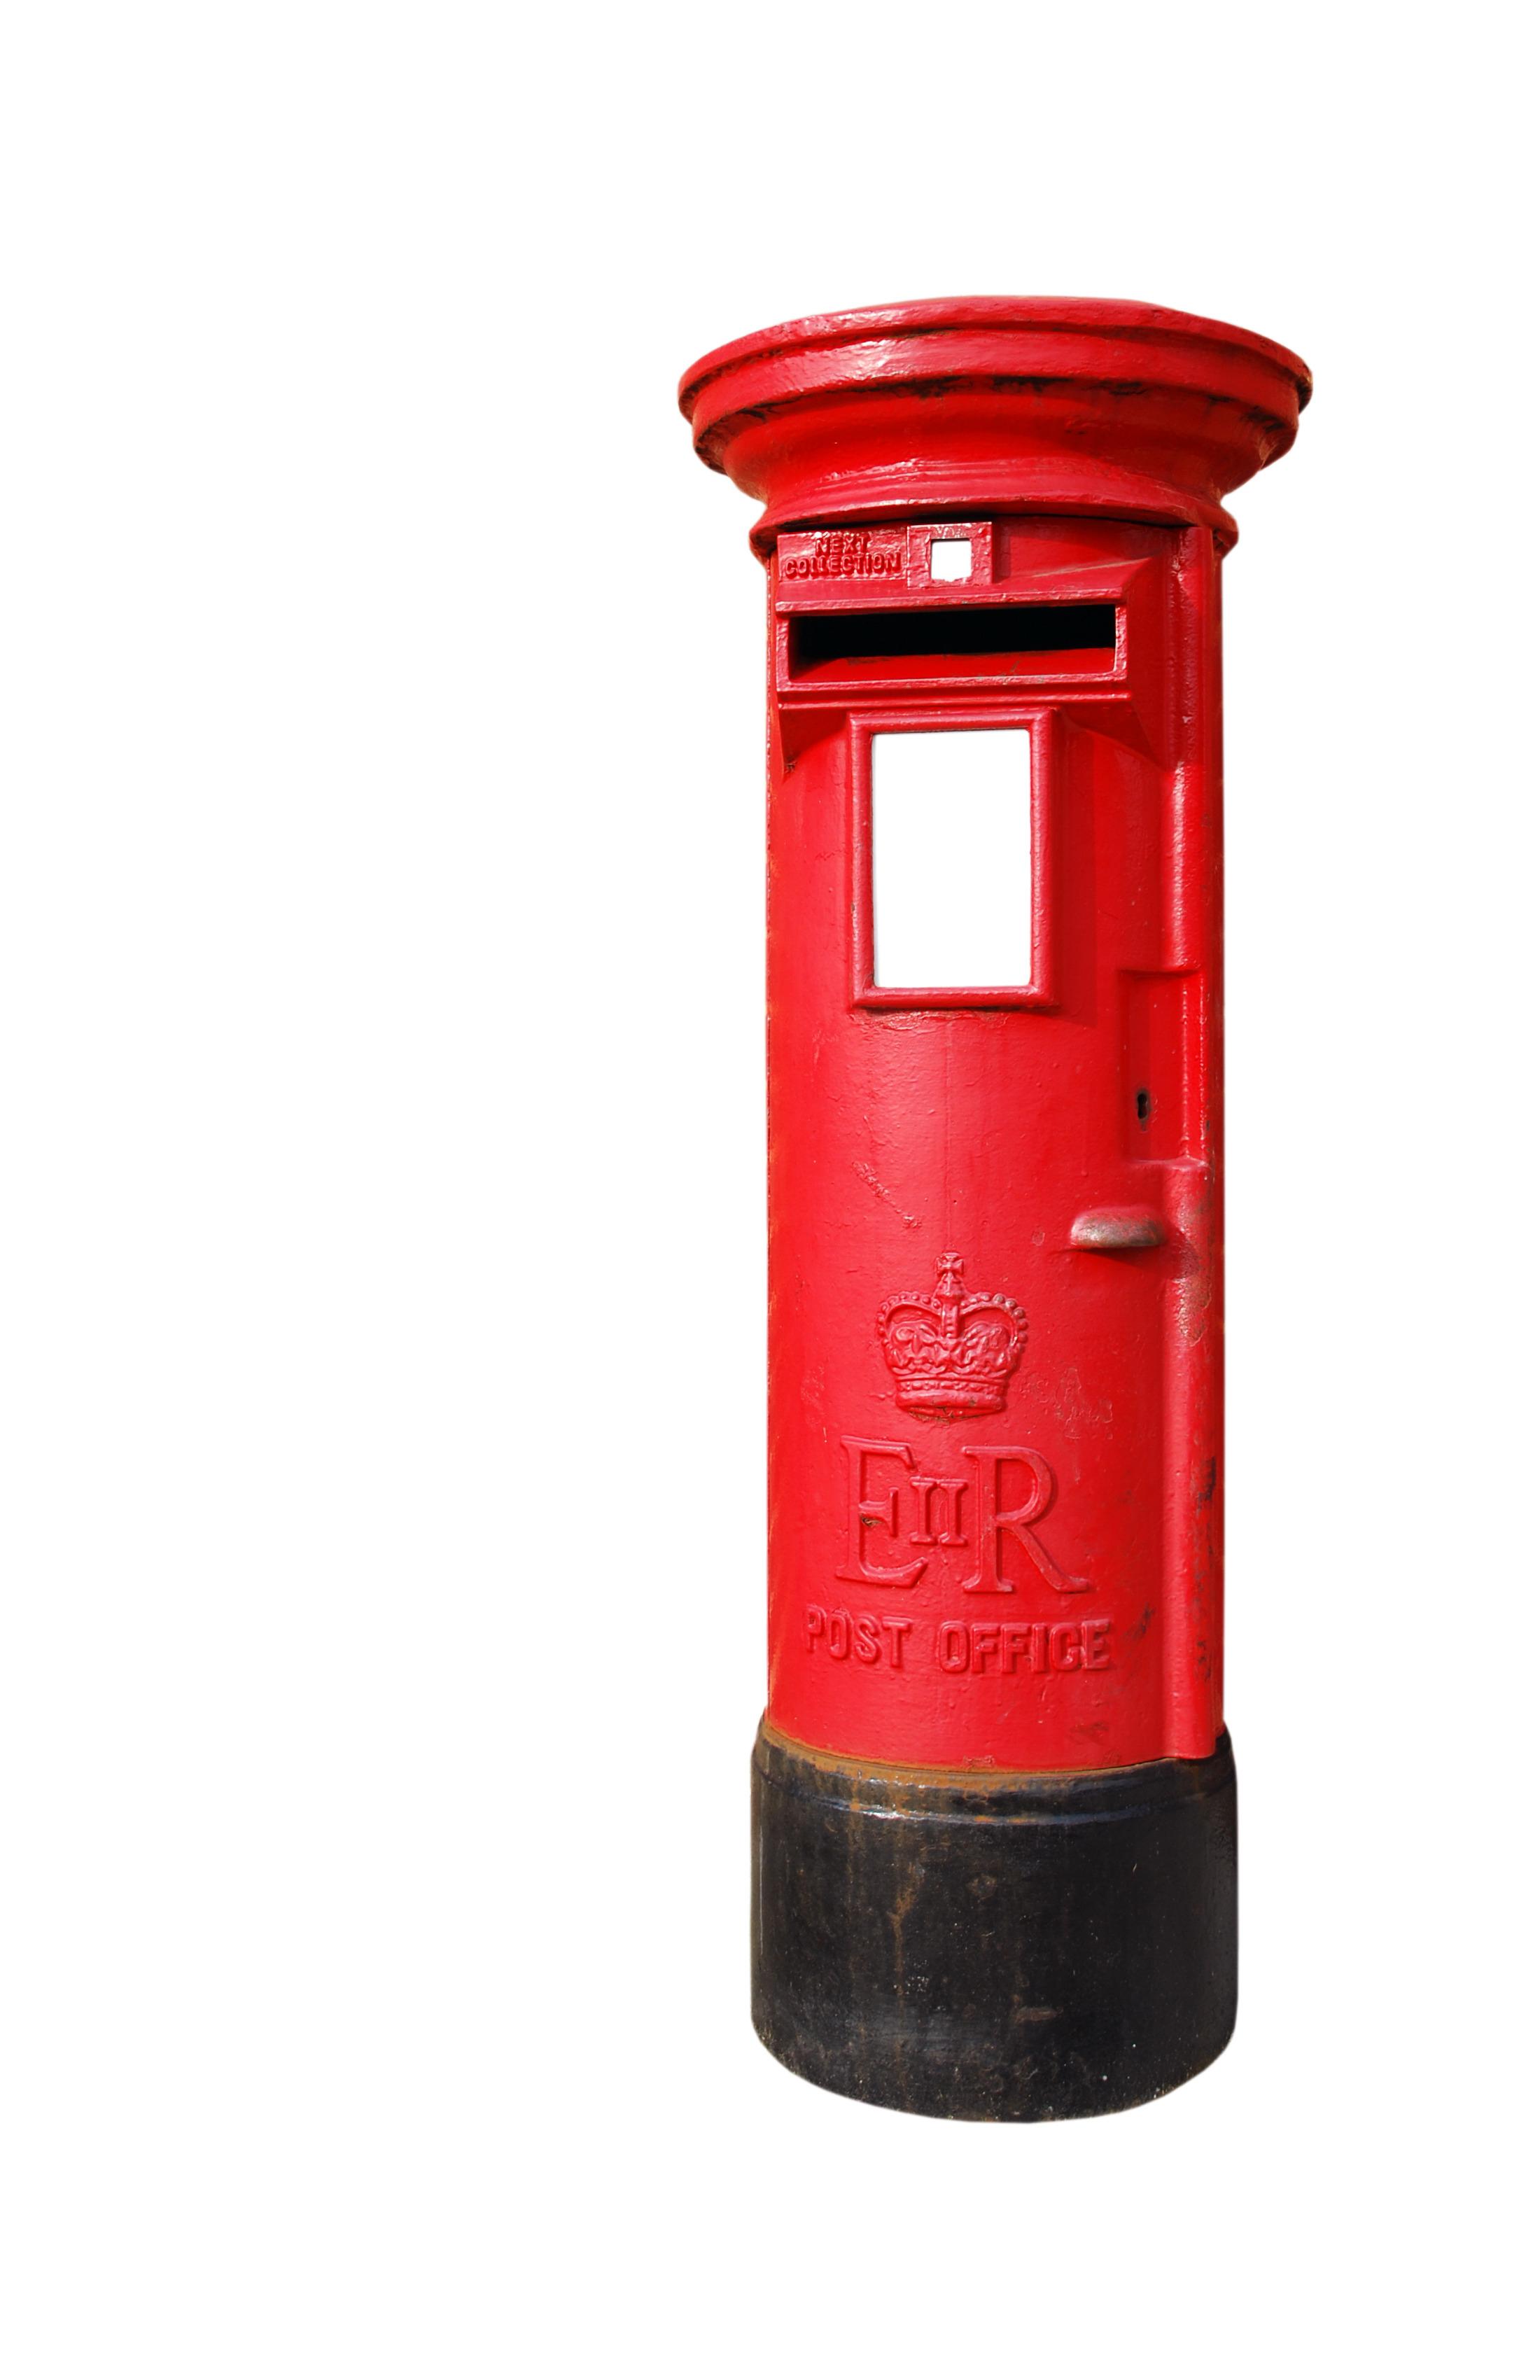 British Postbox Z Jvhb 0D